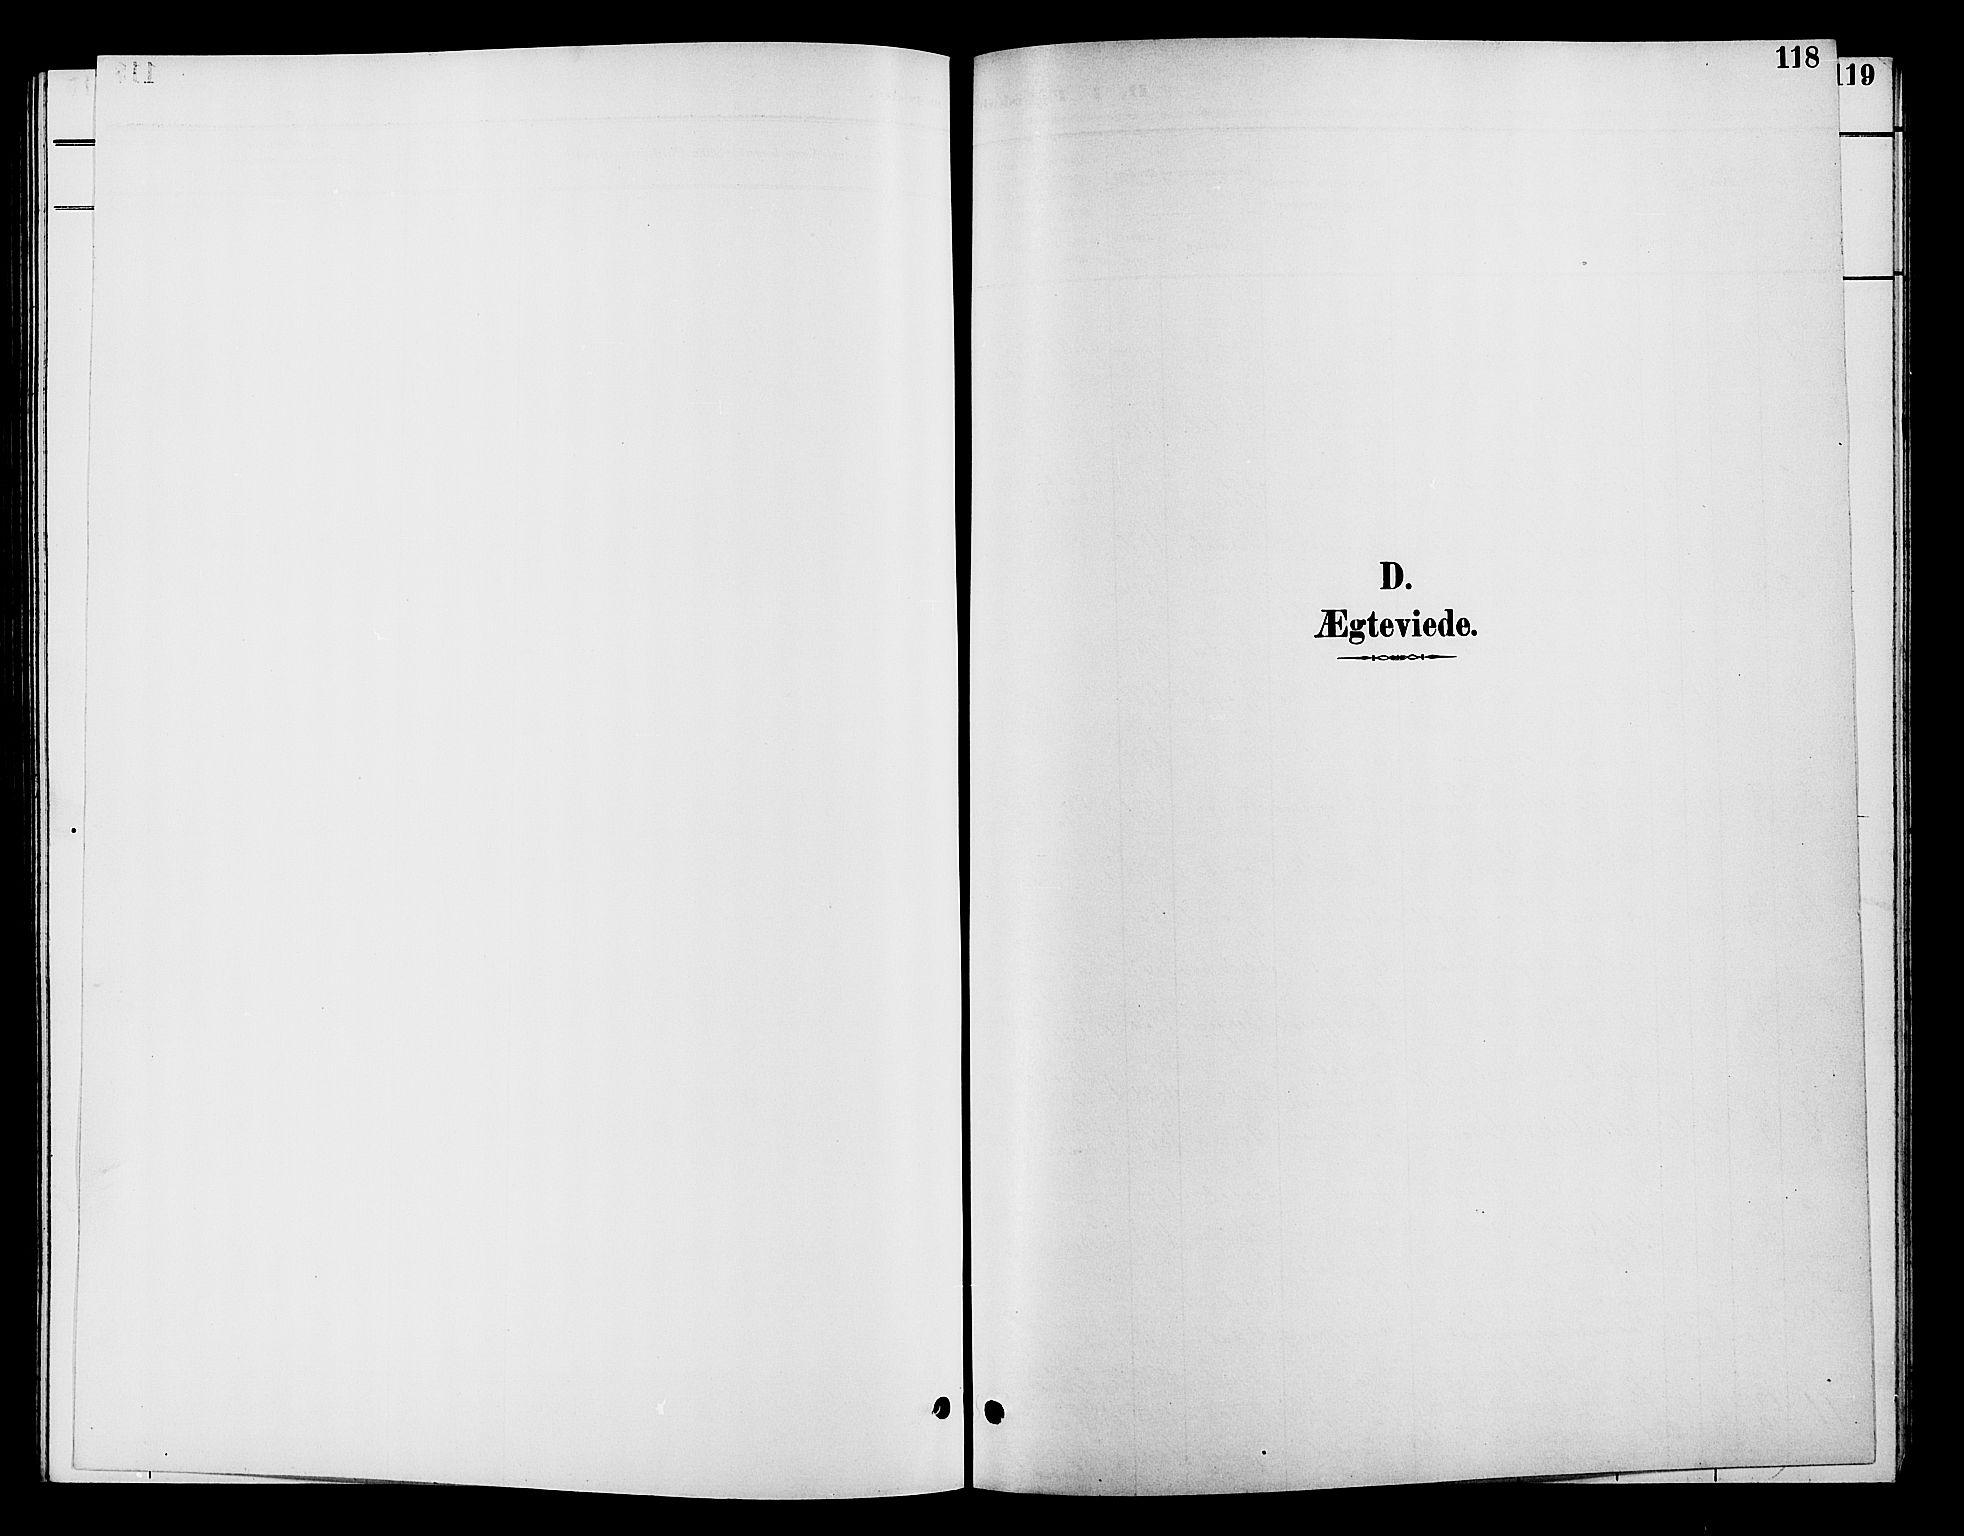 SAH, Vardal prestekontor, H/Ha/Hab/L0009: Klokkerbok nr. 9, 1894-1902, s. 118